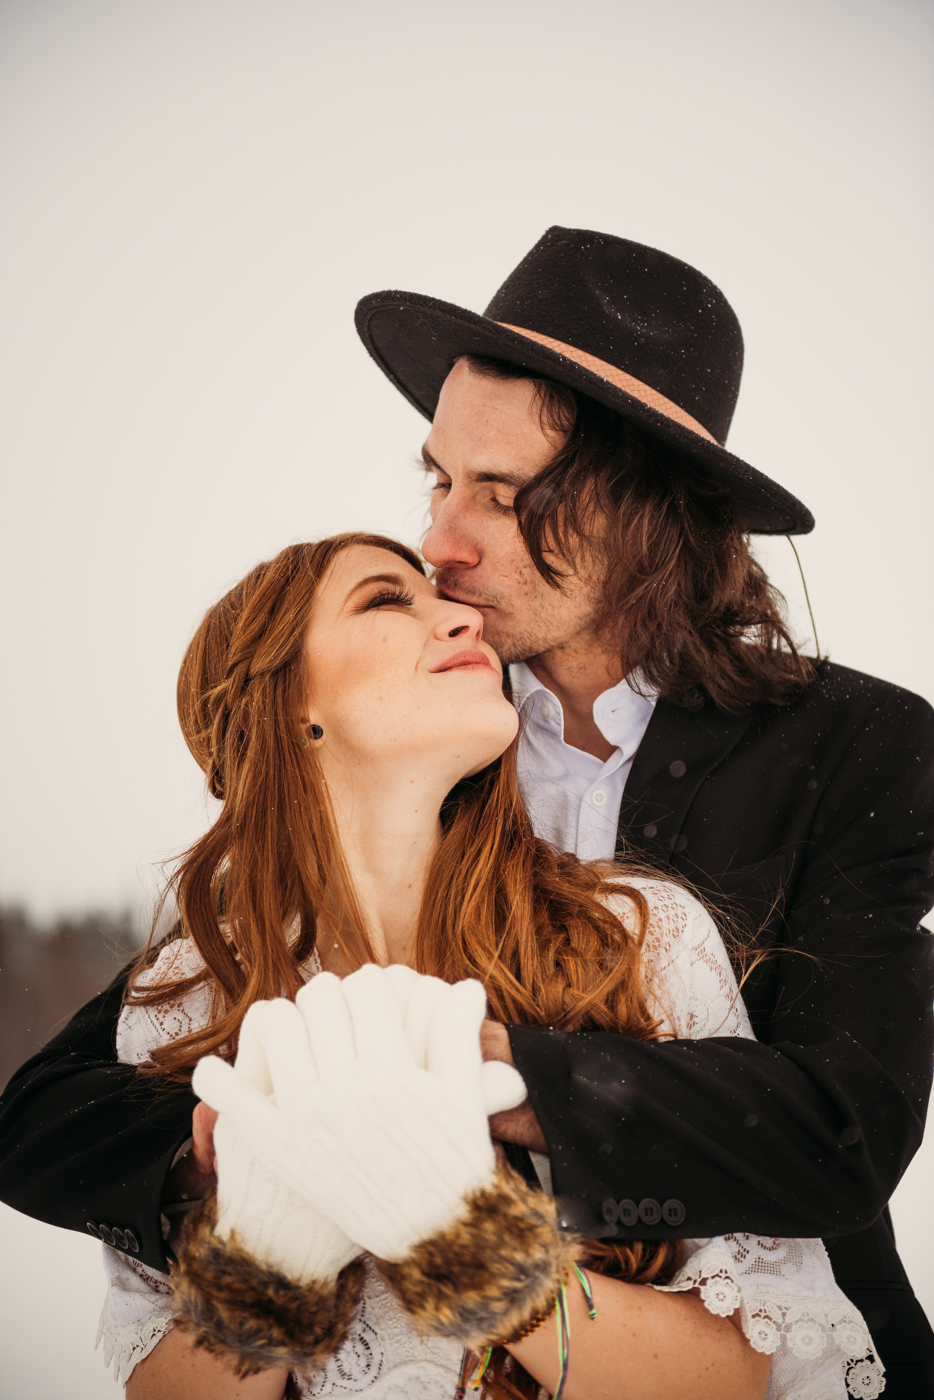 FortSt.John_photographer_TyraEPhotography_Wedding_Couple_Family_Photograhy_DawsonCreek_Elopement_Bride_Boduoir_Portraits-5049.jpg